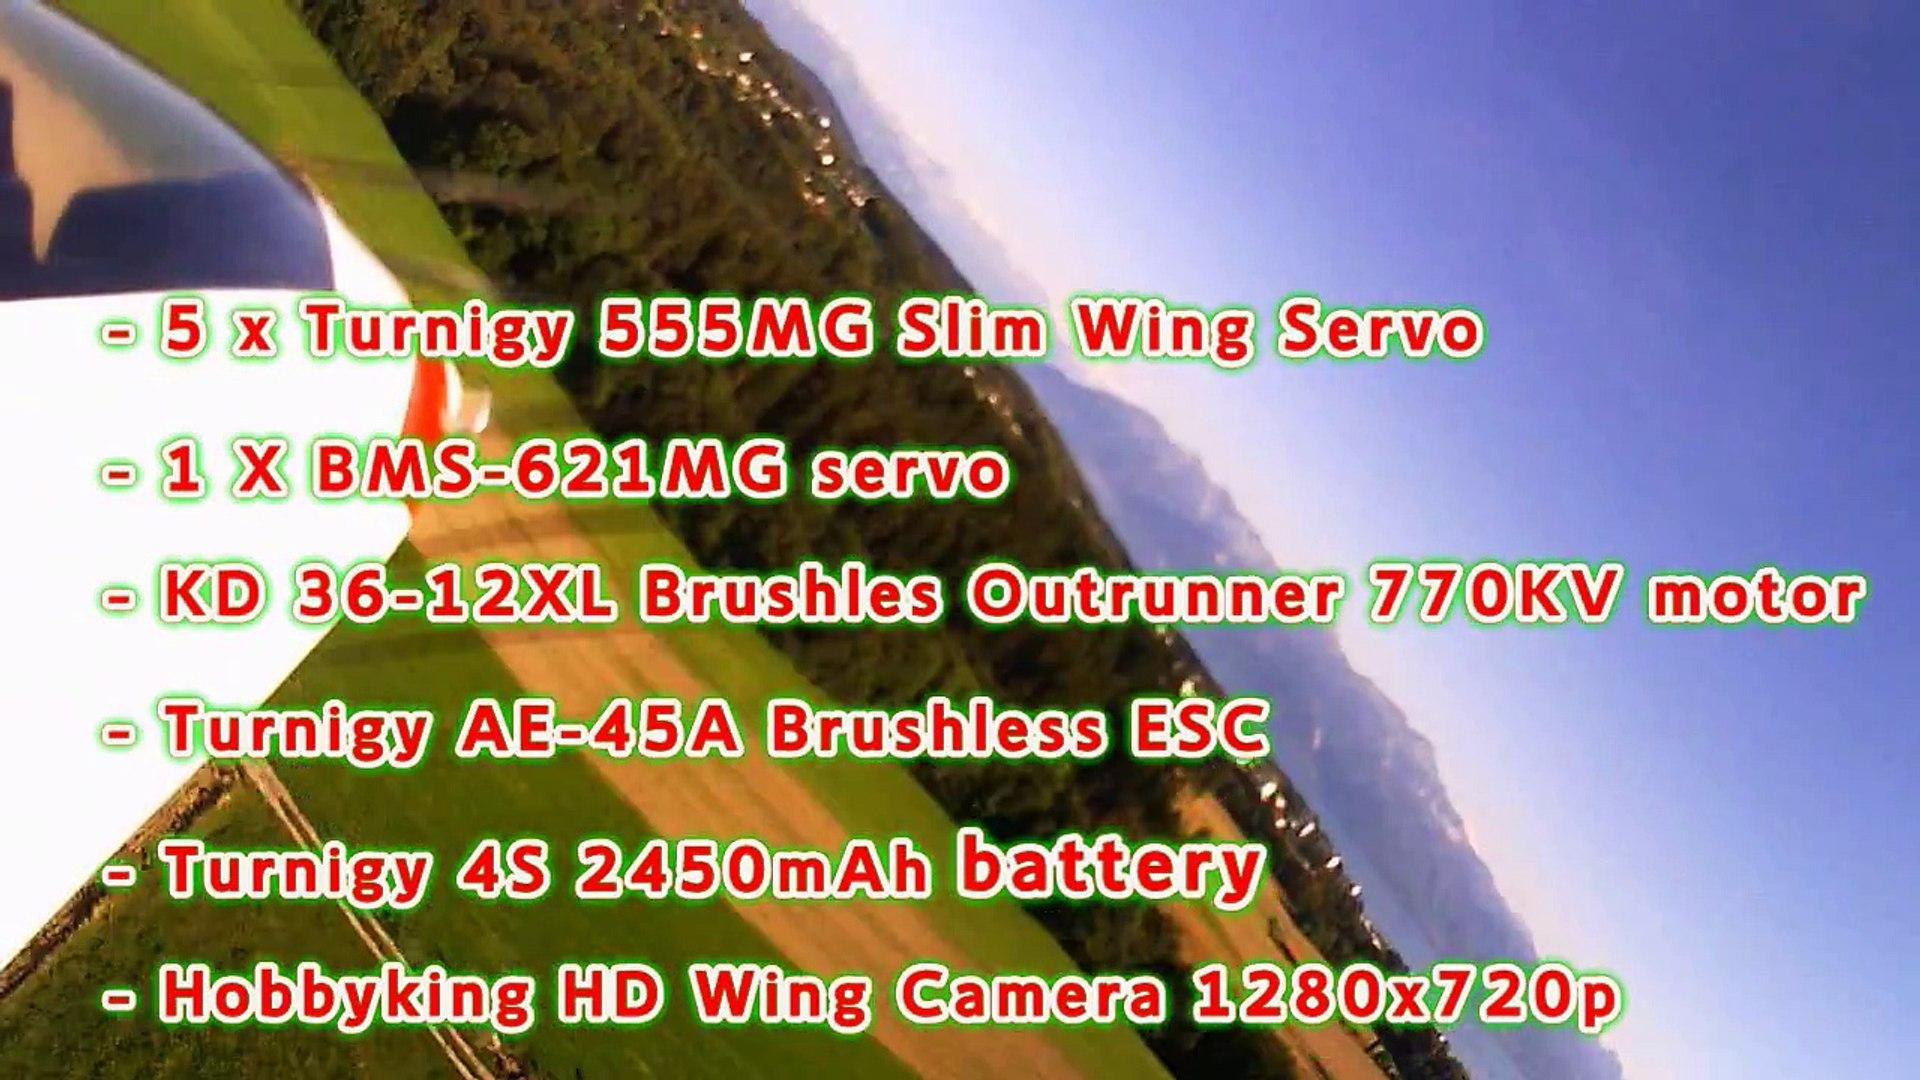 ASK21 EP Glider 2600mm Fiberglass (ARF) HobbyKing